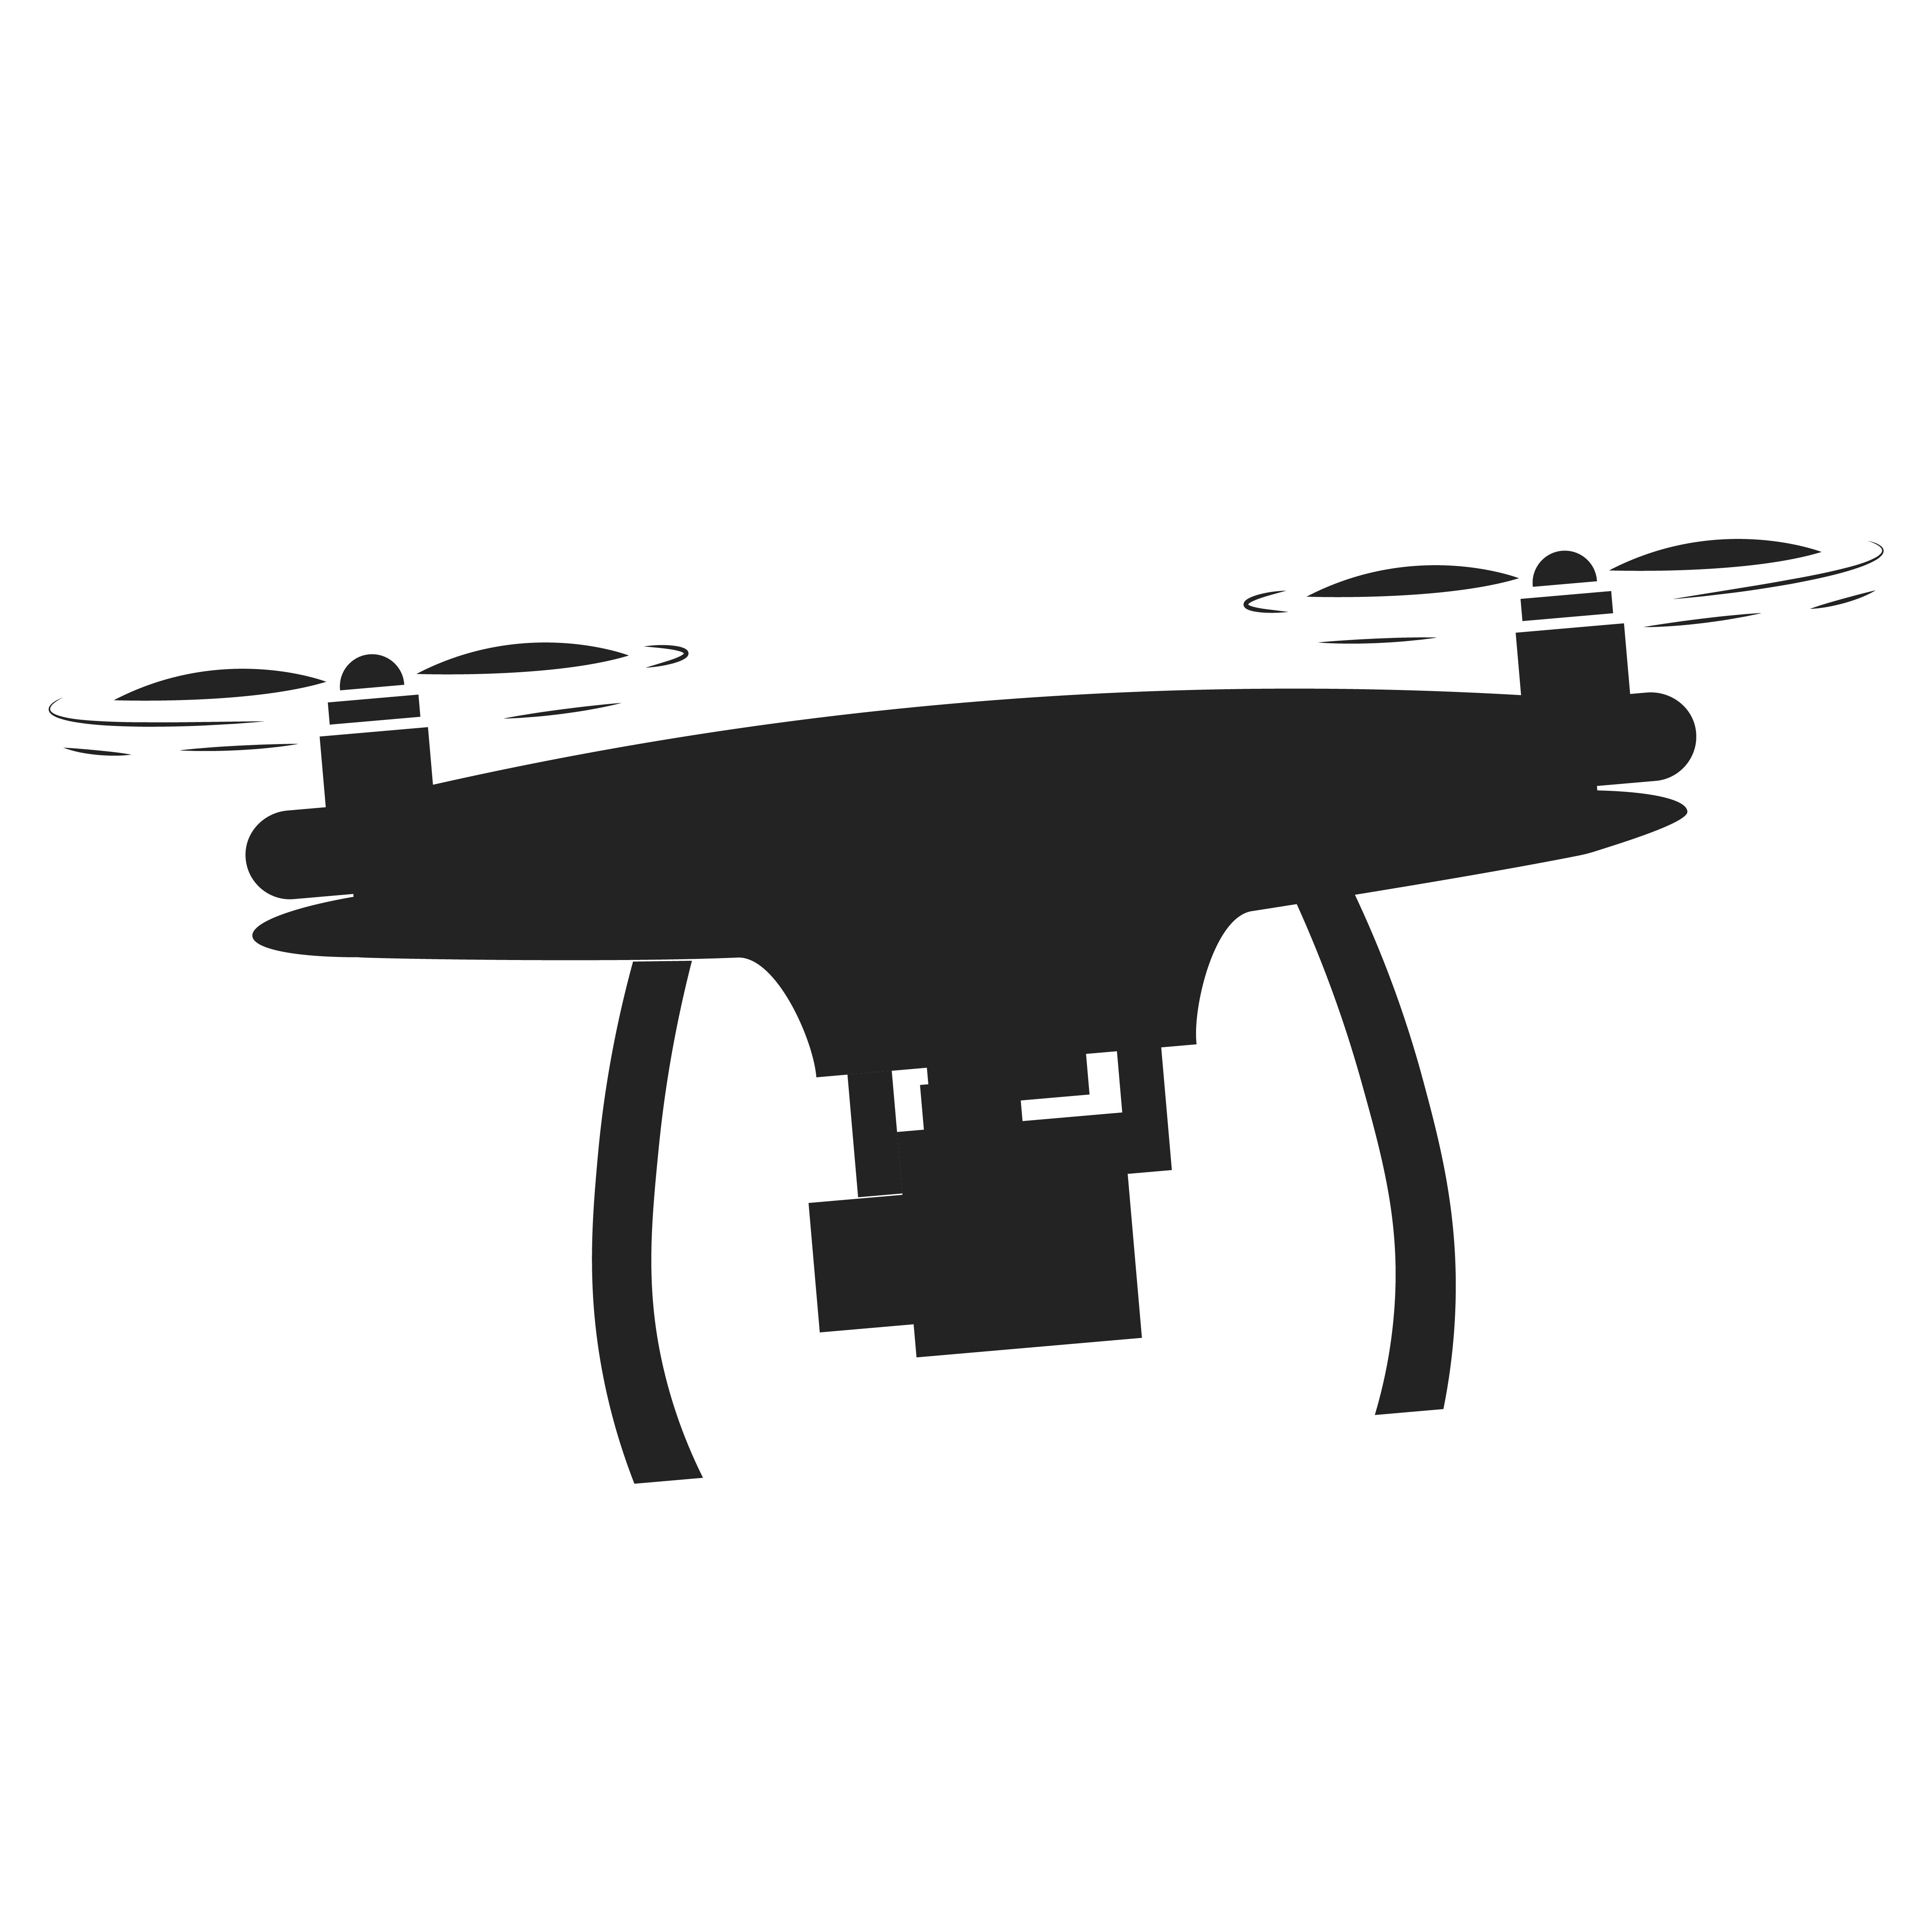 Pro Drone Logo Design: No Drone Zone Sign. No Fly Zone. Vector Flat Illustration